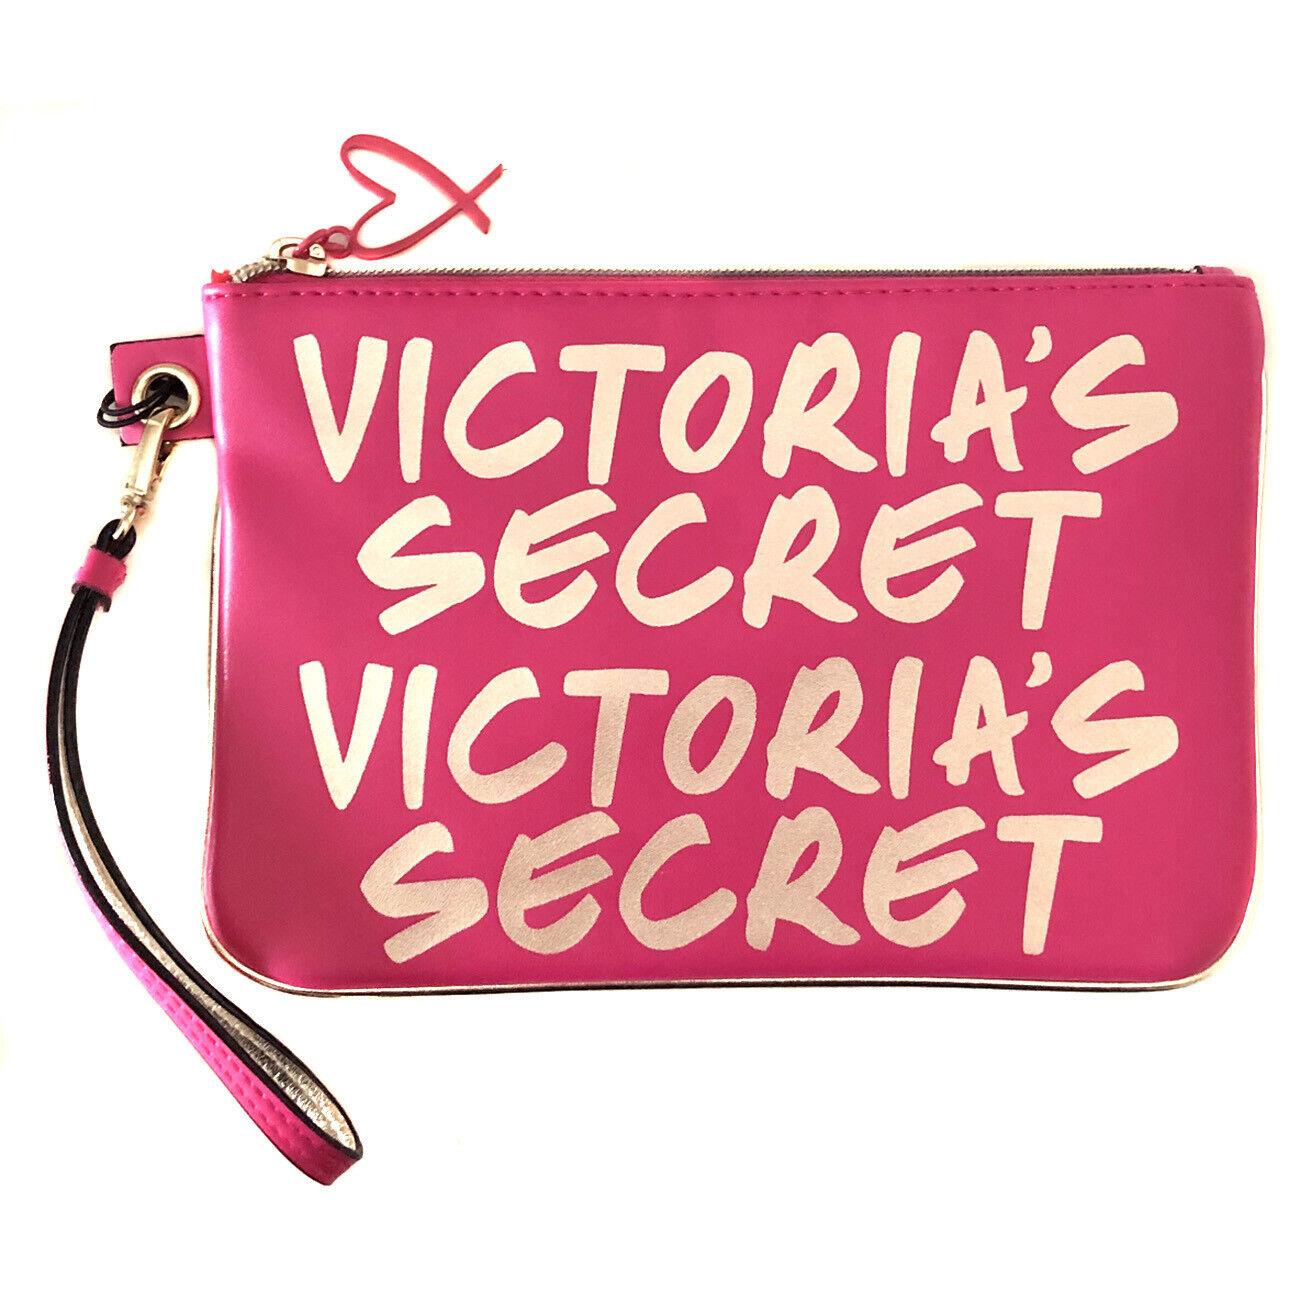 New VICTORIA'S SECRET 'Night Out' Logo Wristlet Purse Wallet Clutch Bag